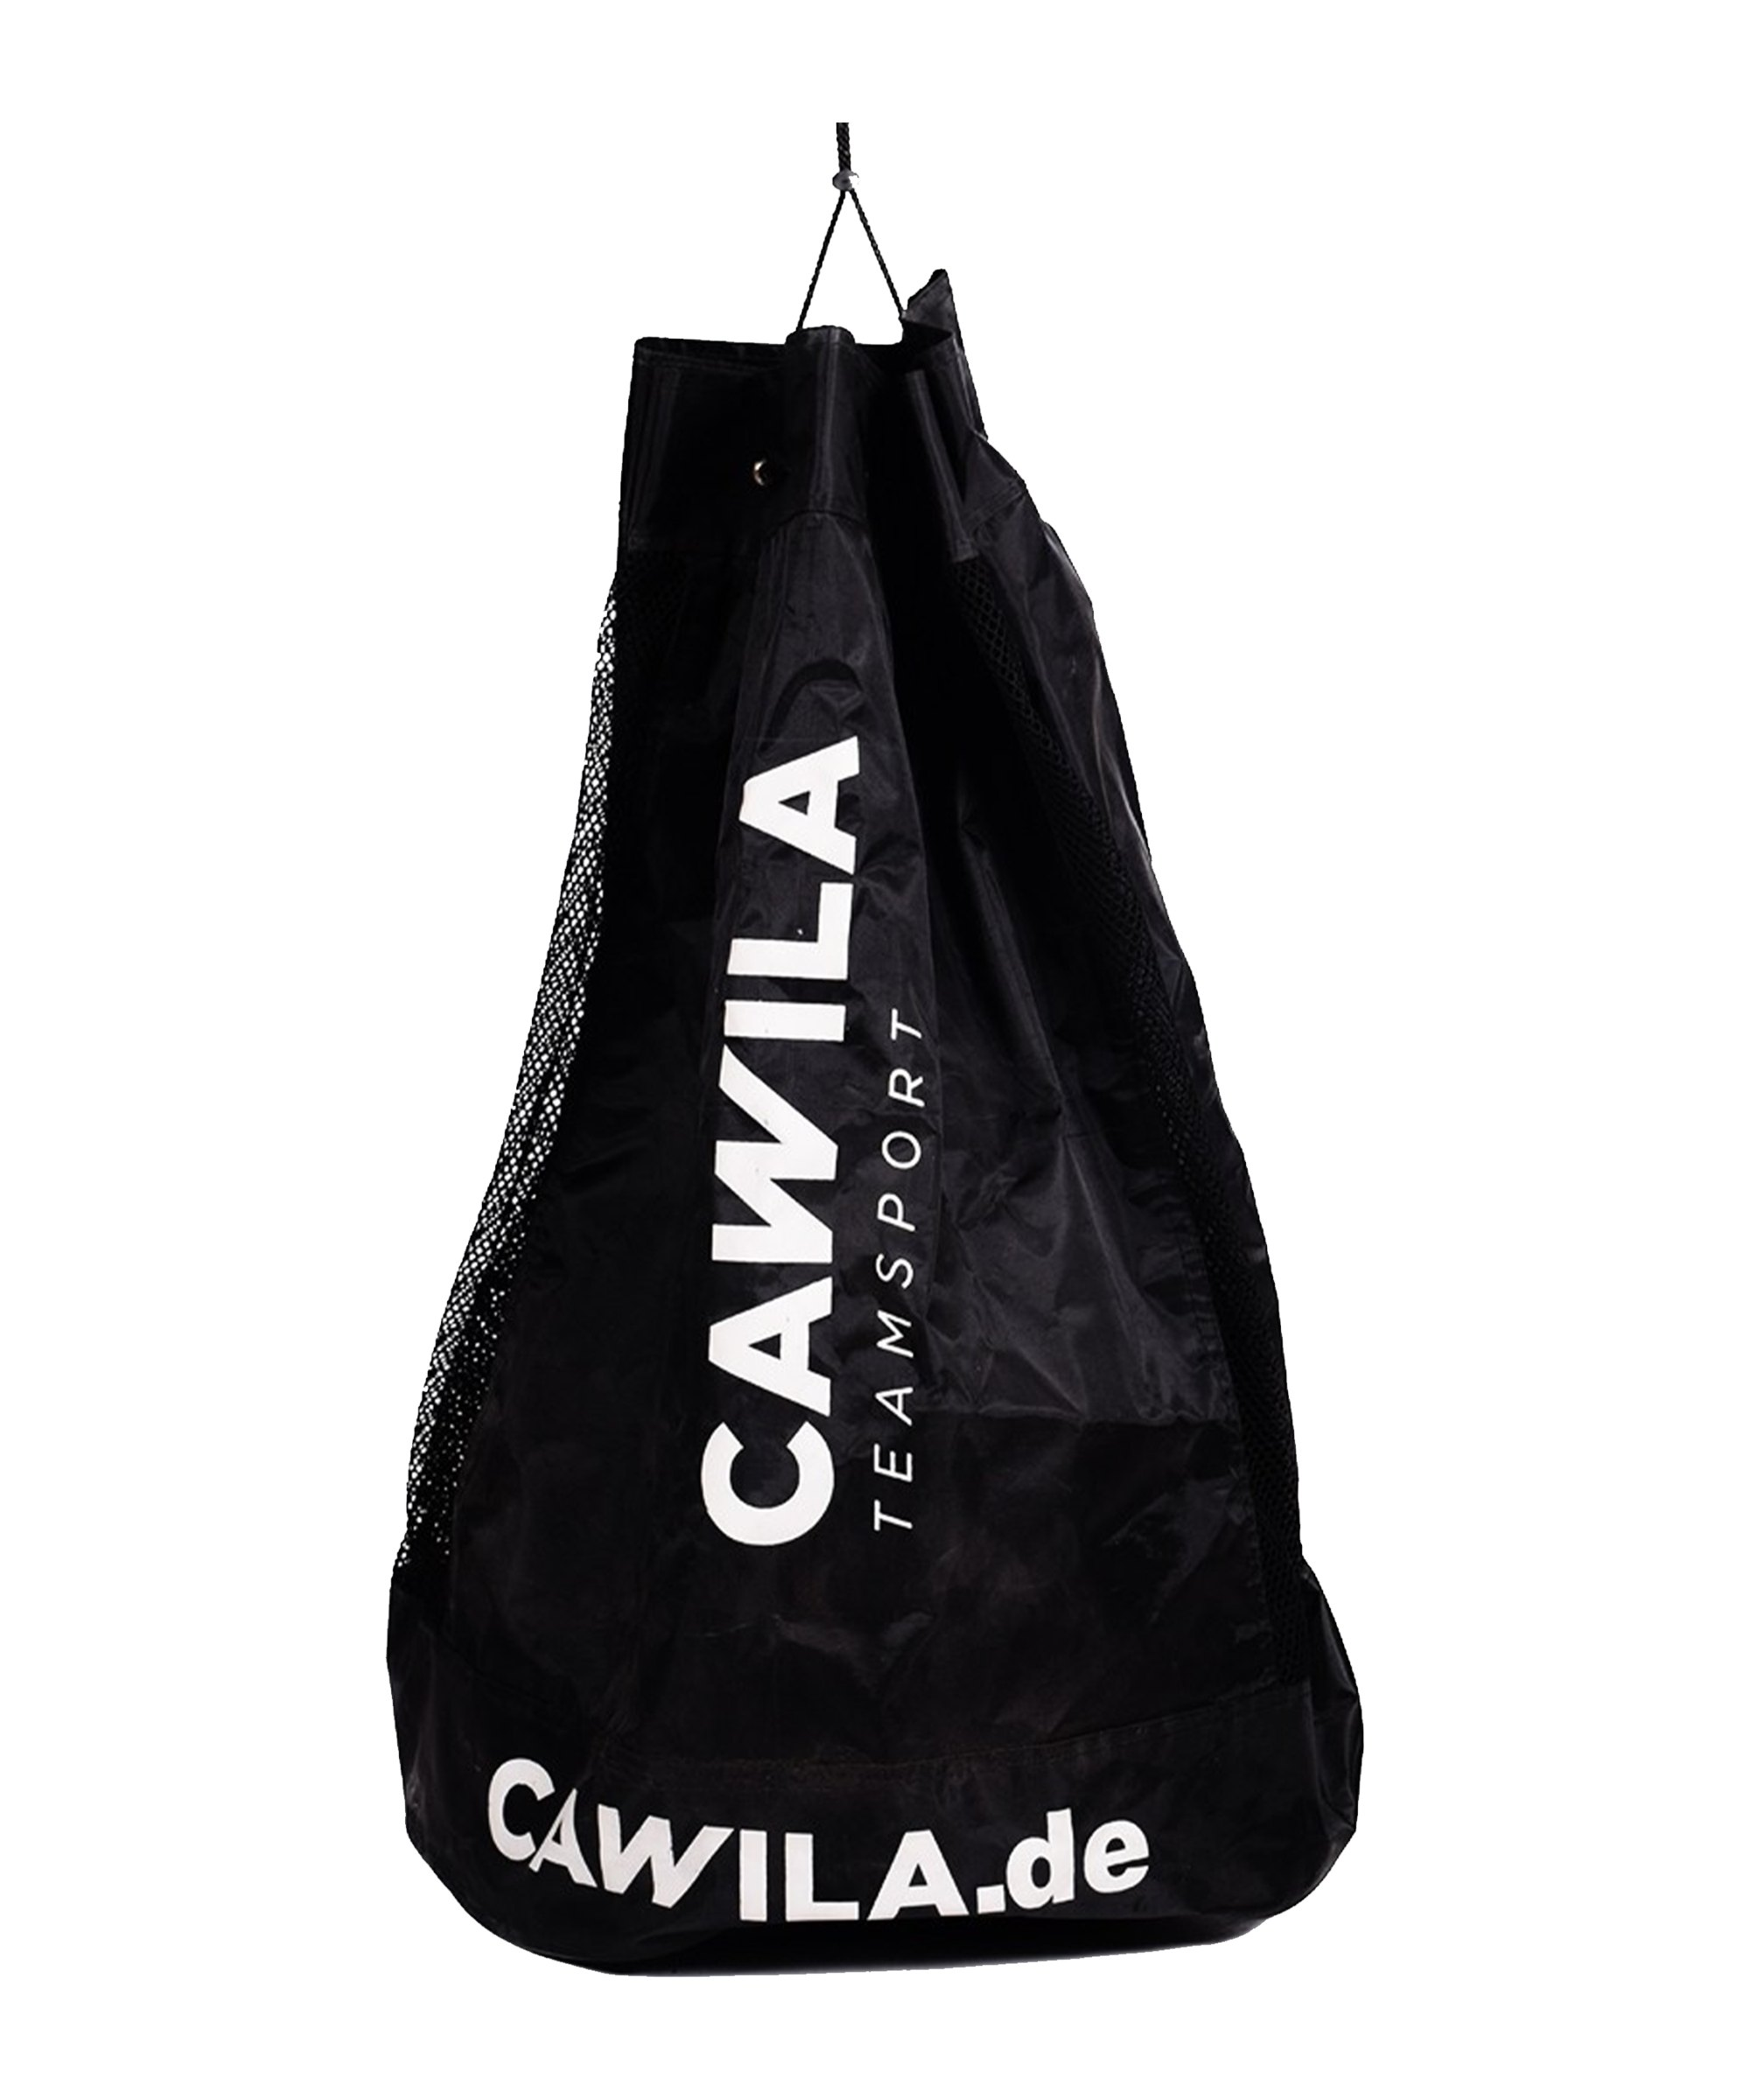 Cawila Ballsack 12 Fussbälle Schwarz - schwarz